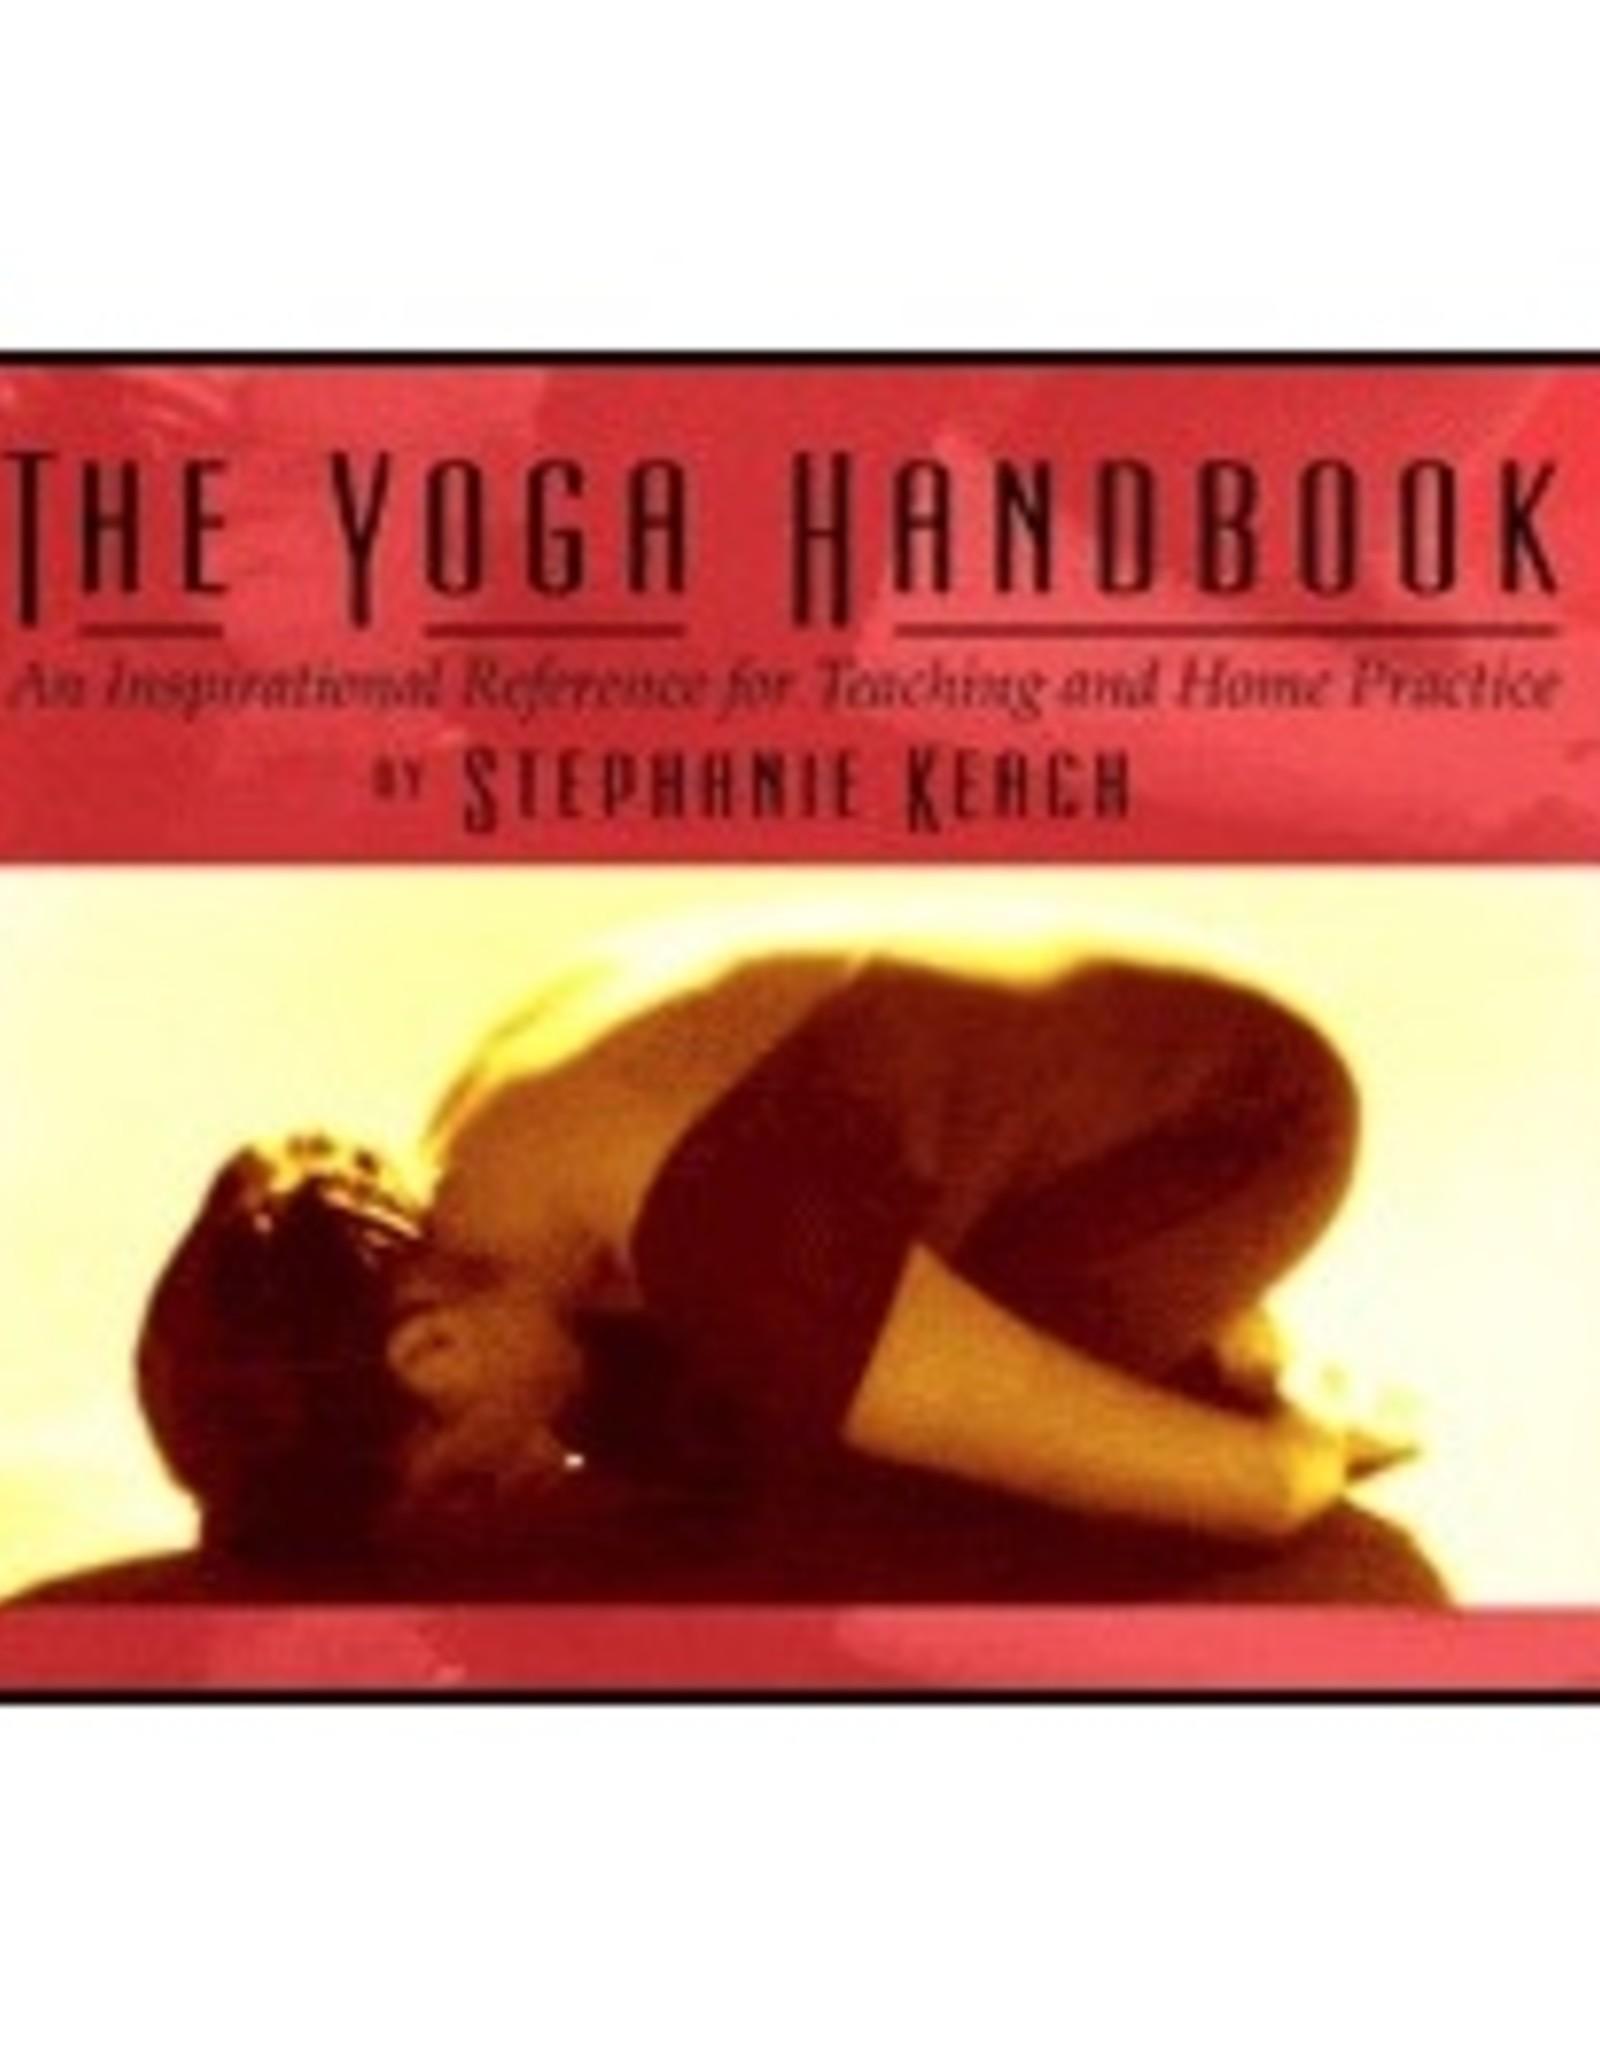 The Yoga Handbook by Stephanie Keach (200 TT)